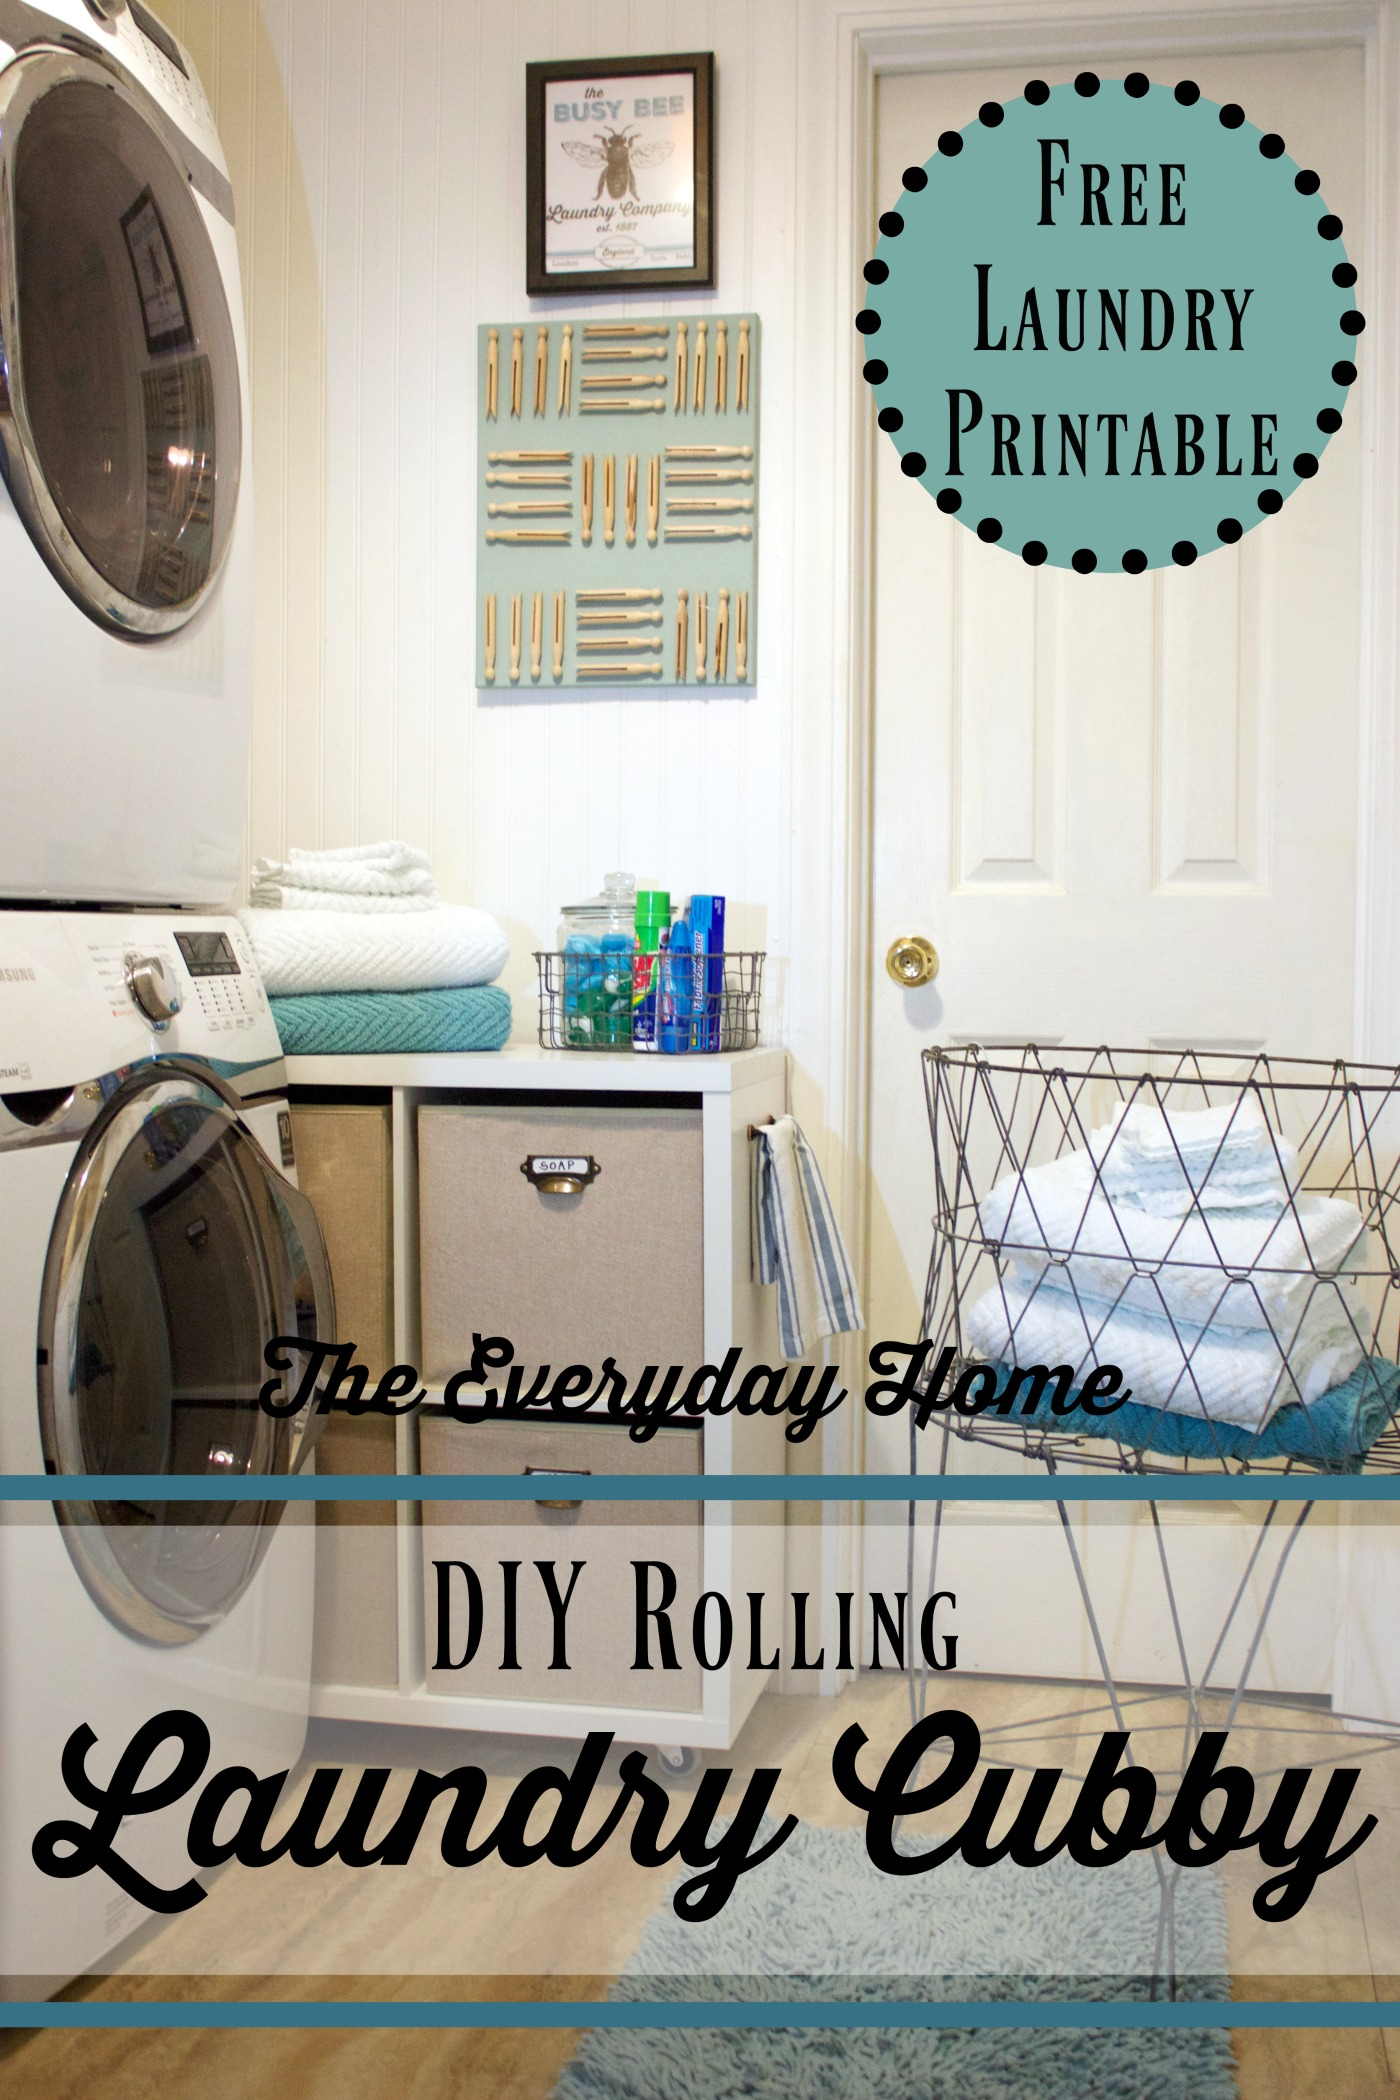 diy-laundry-room-cubby-on-wheels | The Everyday Home | www.everydayhomeblog.com